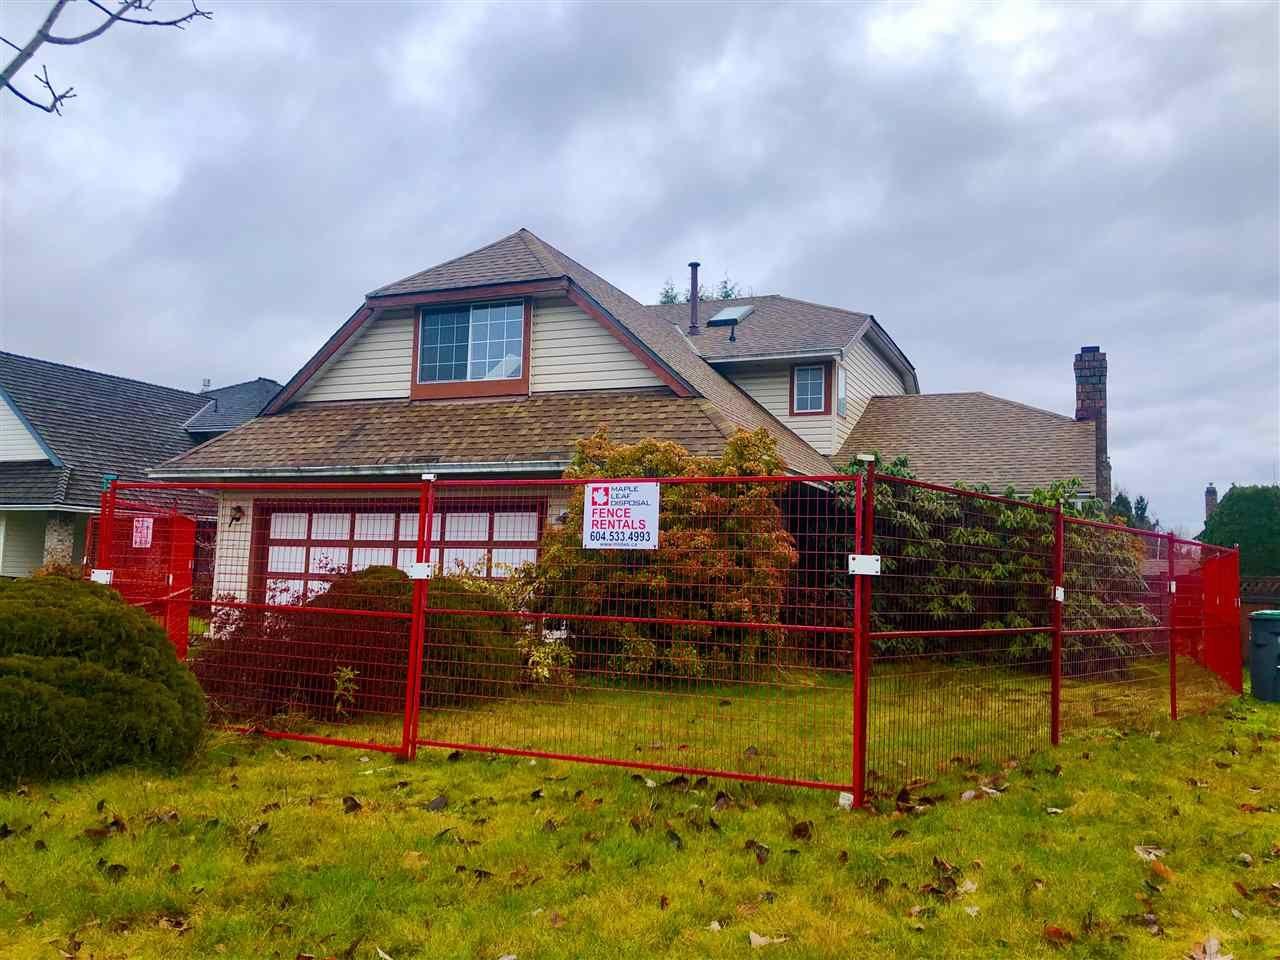 Main Photo: 9120 160A Street in Surrey: Fleetwood Tynehead House for sale : MLS®# R2522652